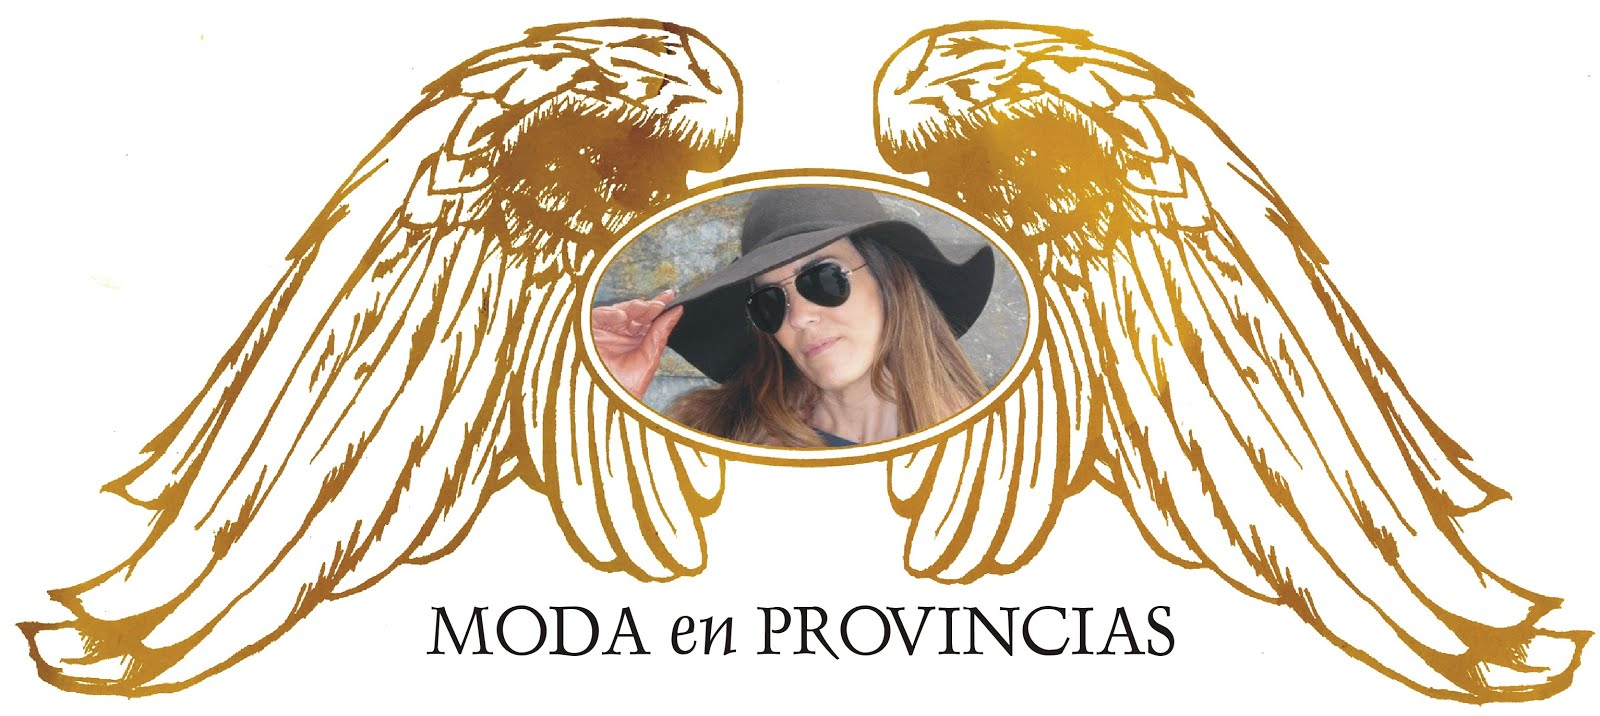 MODA EN PROVINCIAS